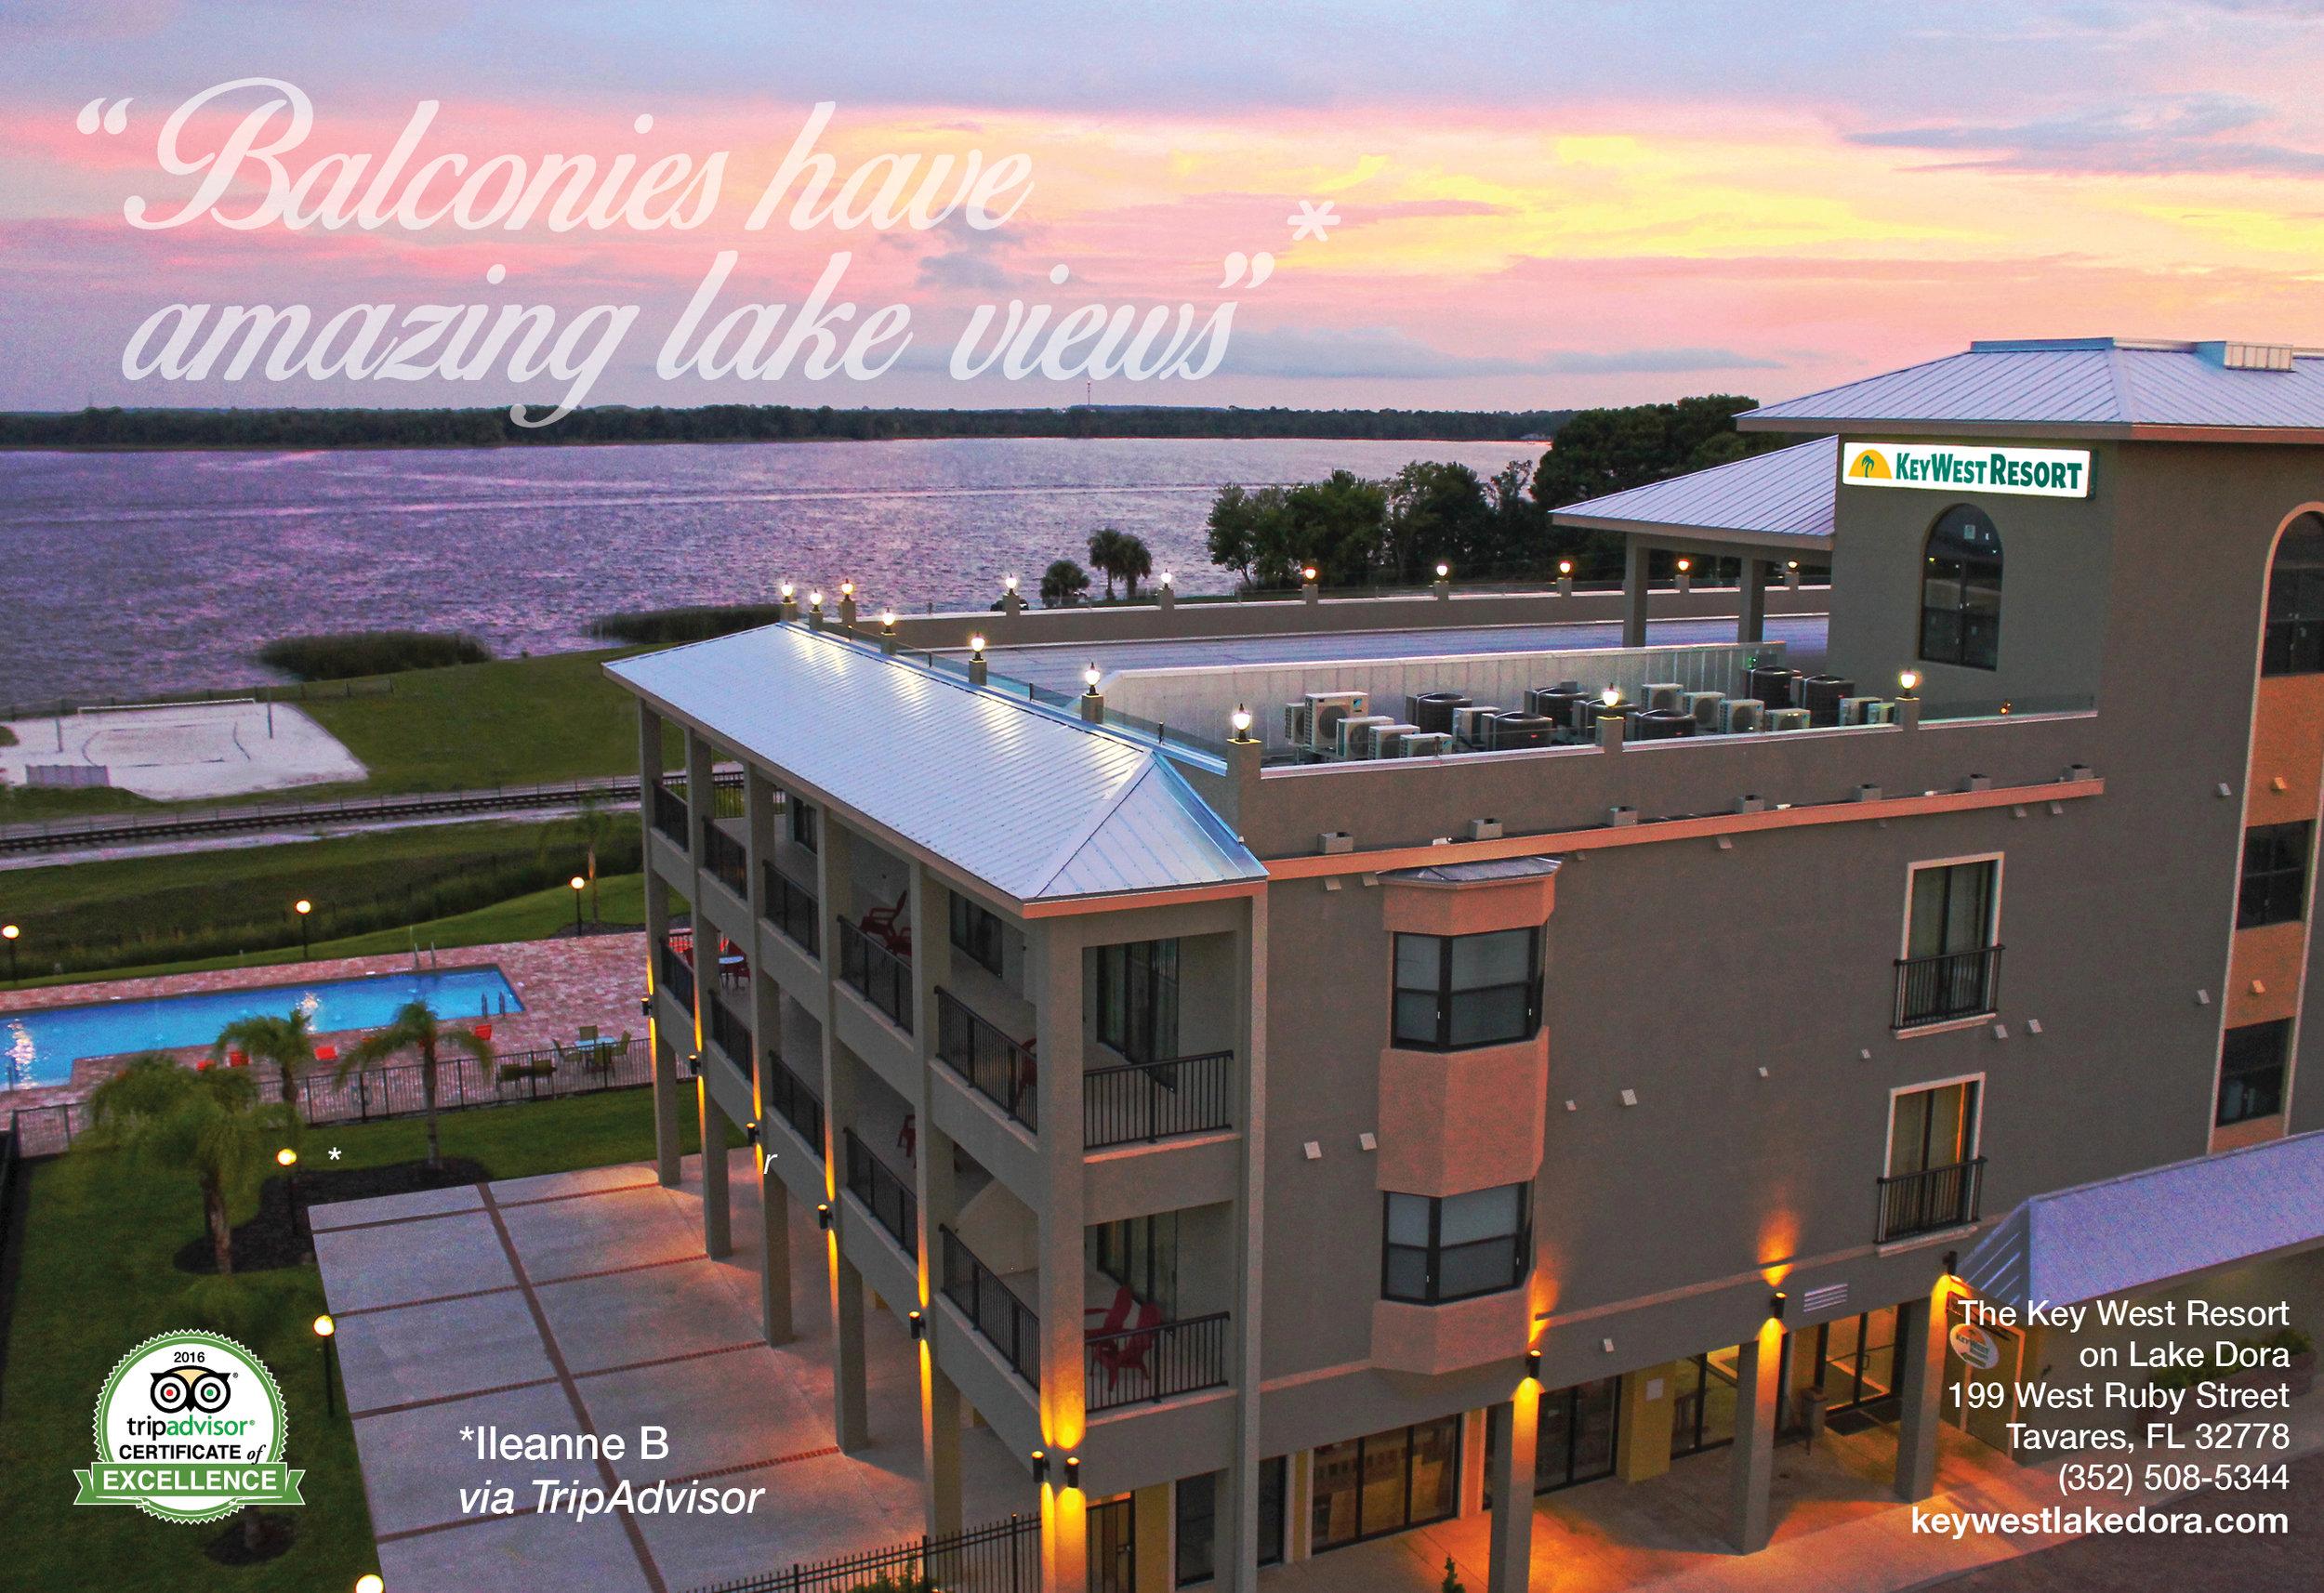 Copy of The Key West Resort on Lake Dora